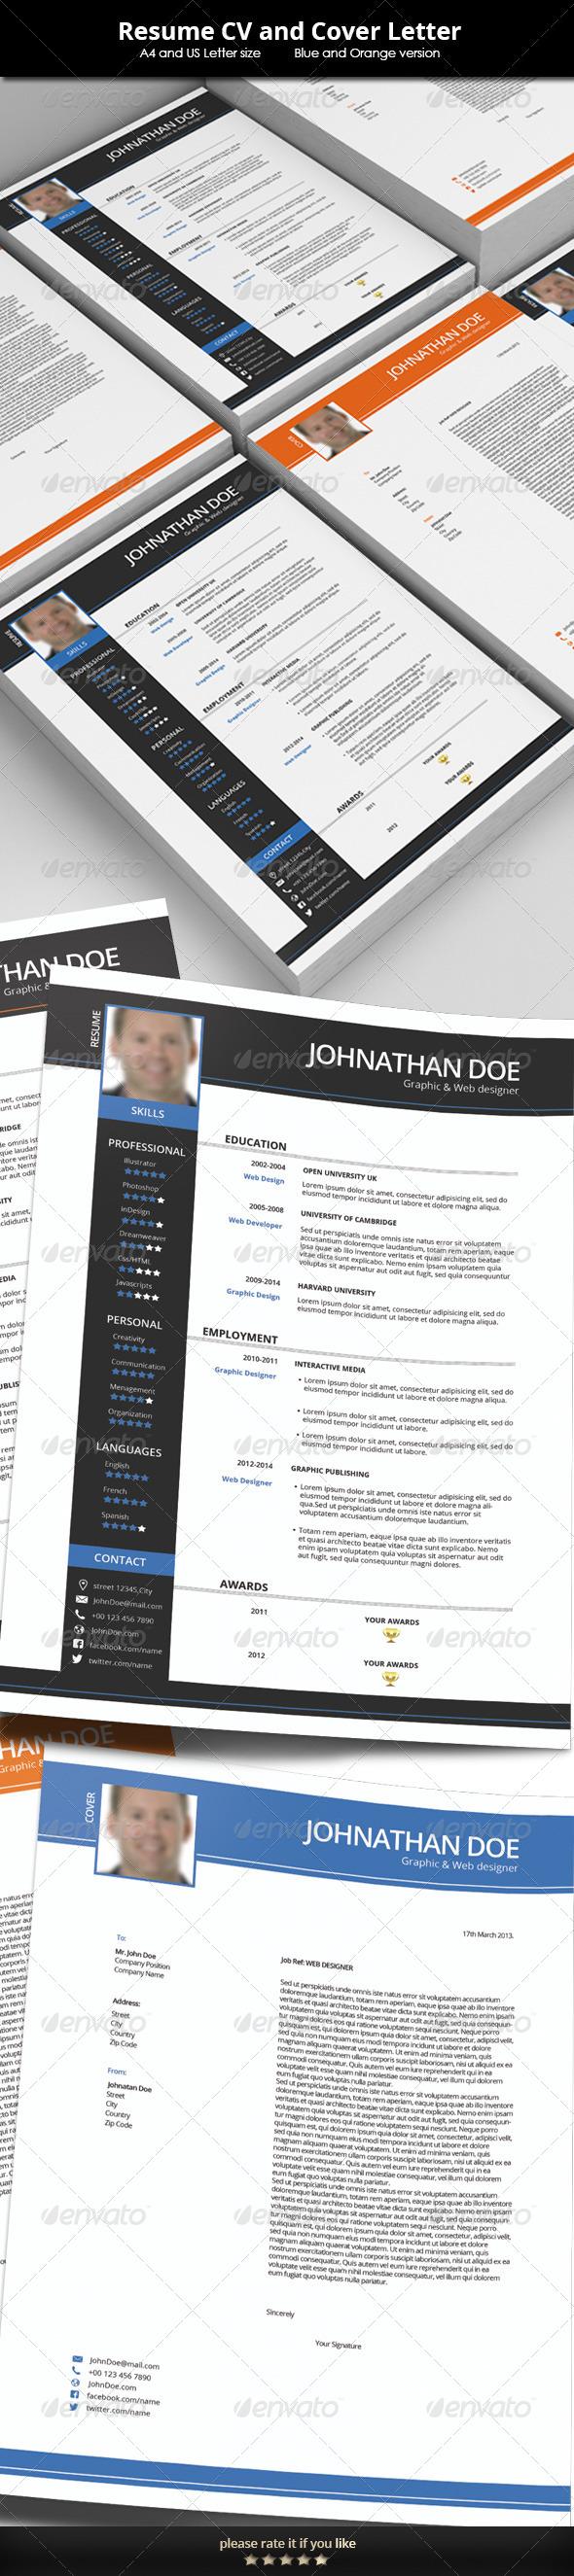 GraphicRiver Resume CV Template 7155787